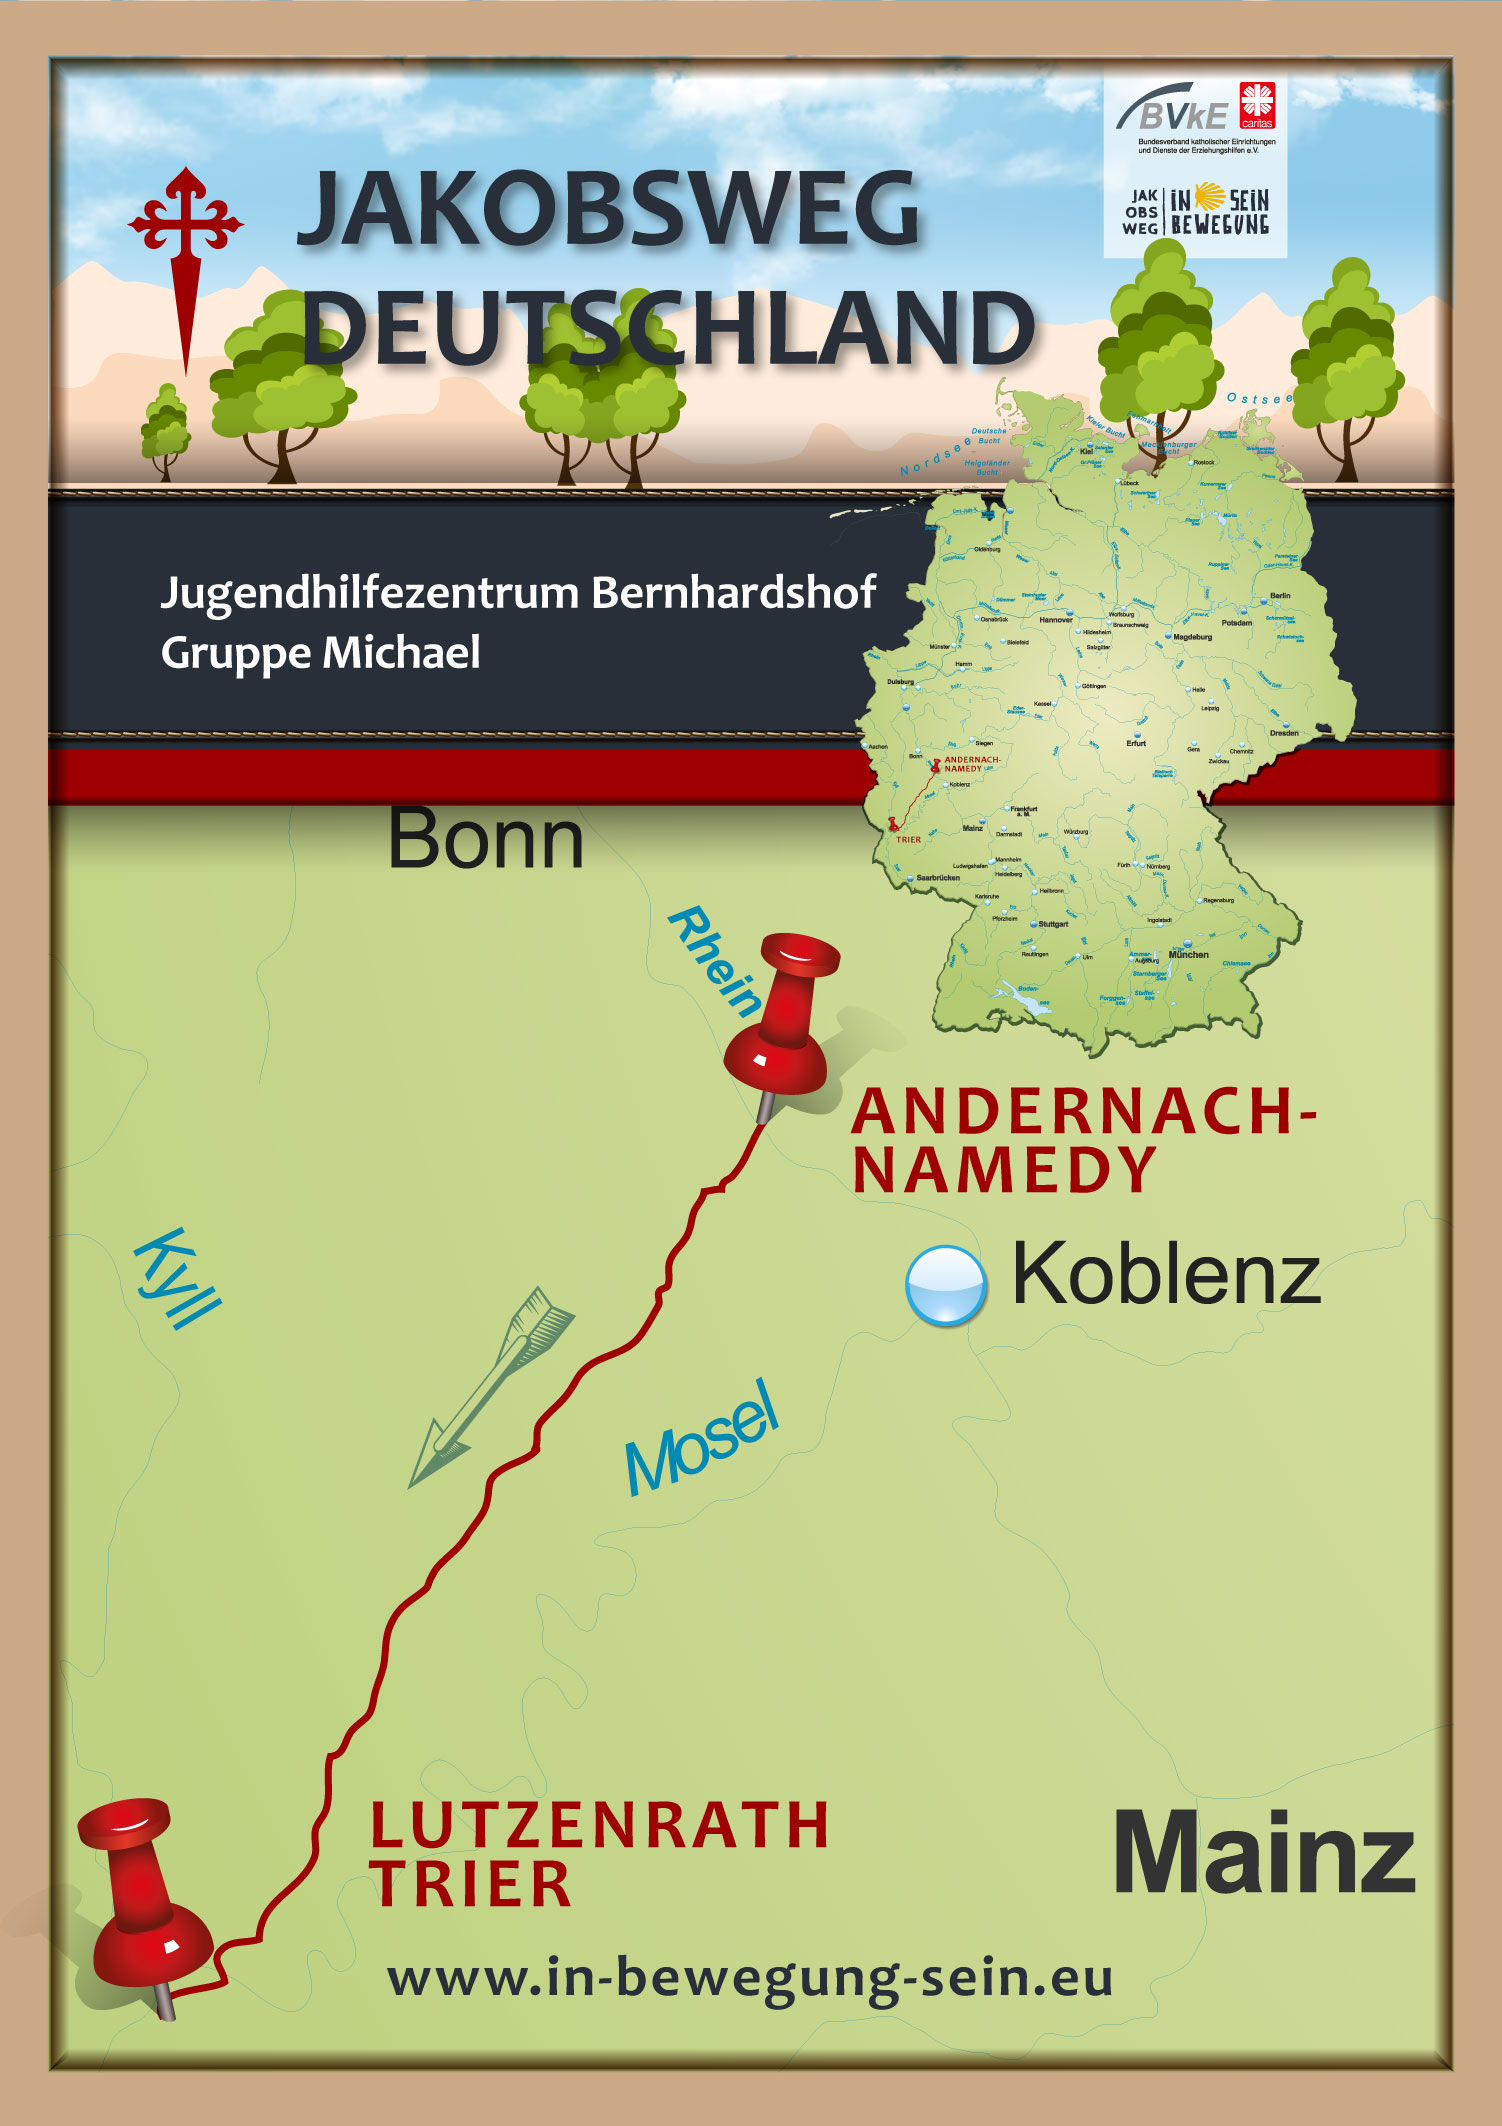 Posterkarte-JUGENDHILFEZENTRUM-BERNHARDSHOF---GRUPPE-MICHAEL